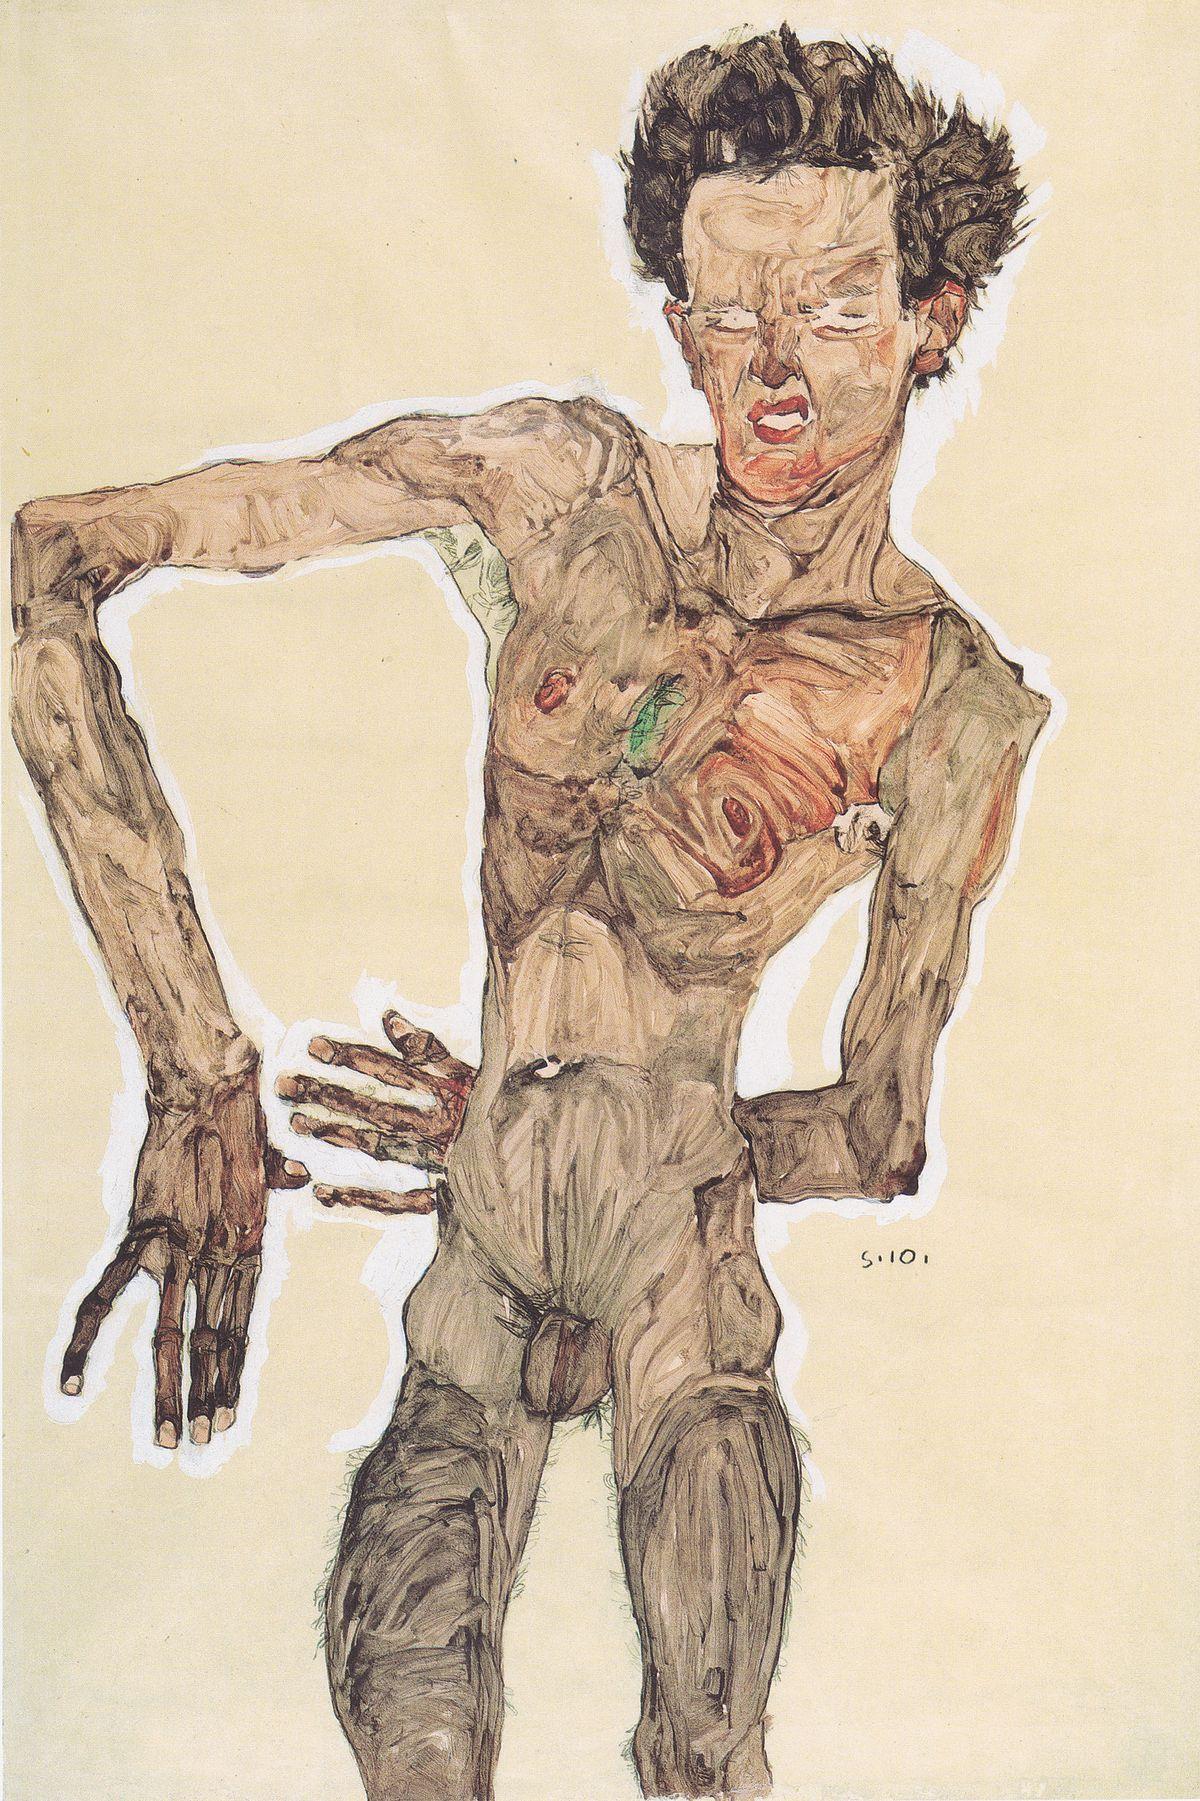 https://upload.wikimedia.org/wikipedia/commons/thumb/a/aa/Egon_Schiele_-_Grimassierendes_Aktselbstbildnis_-_1910.jpeg/1200px-Egon_Schiele_-_Grimassierendes_Aktselbstbildnis_-_1910.jpeg